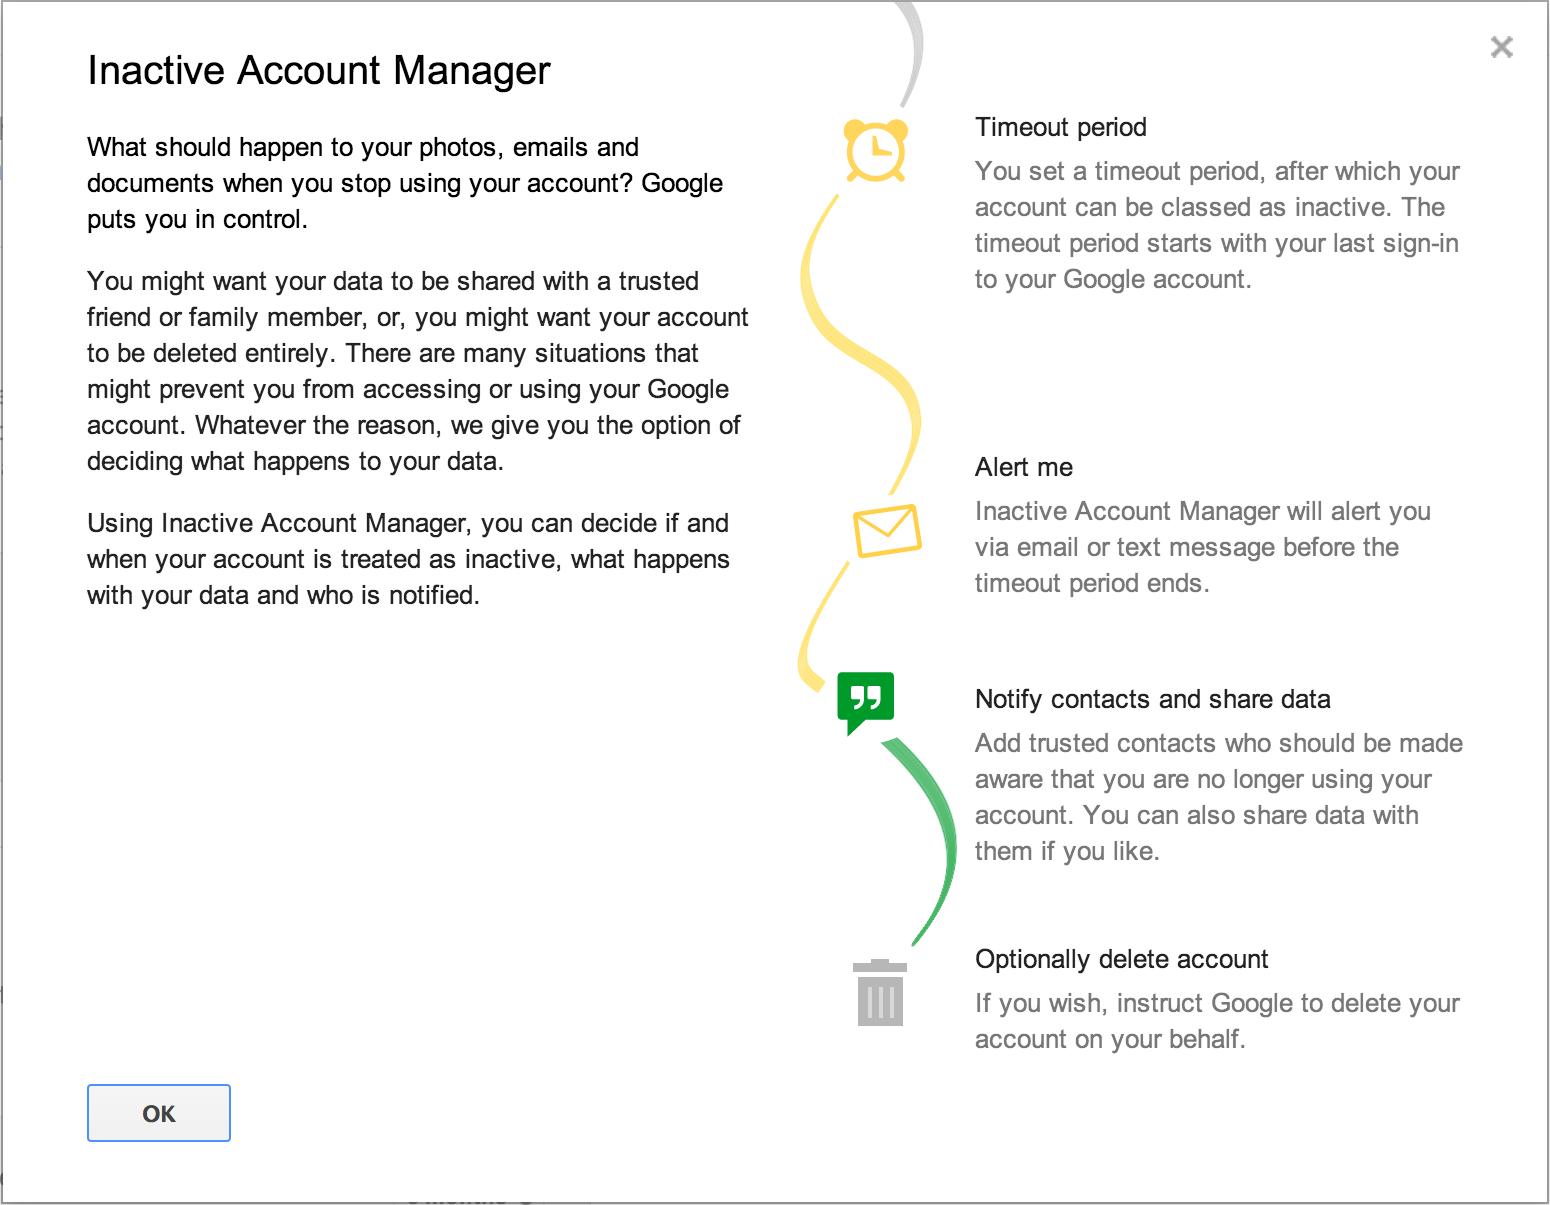 Inter Active ماذا يحصل بـ حساب Google بعد موتك أو إنقطاعك عنه